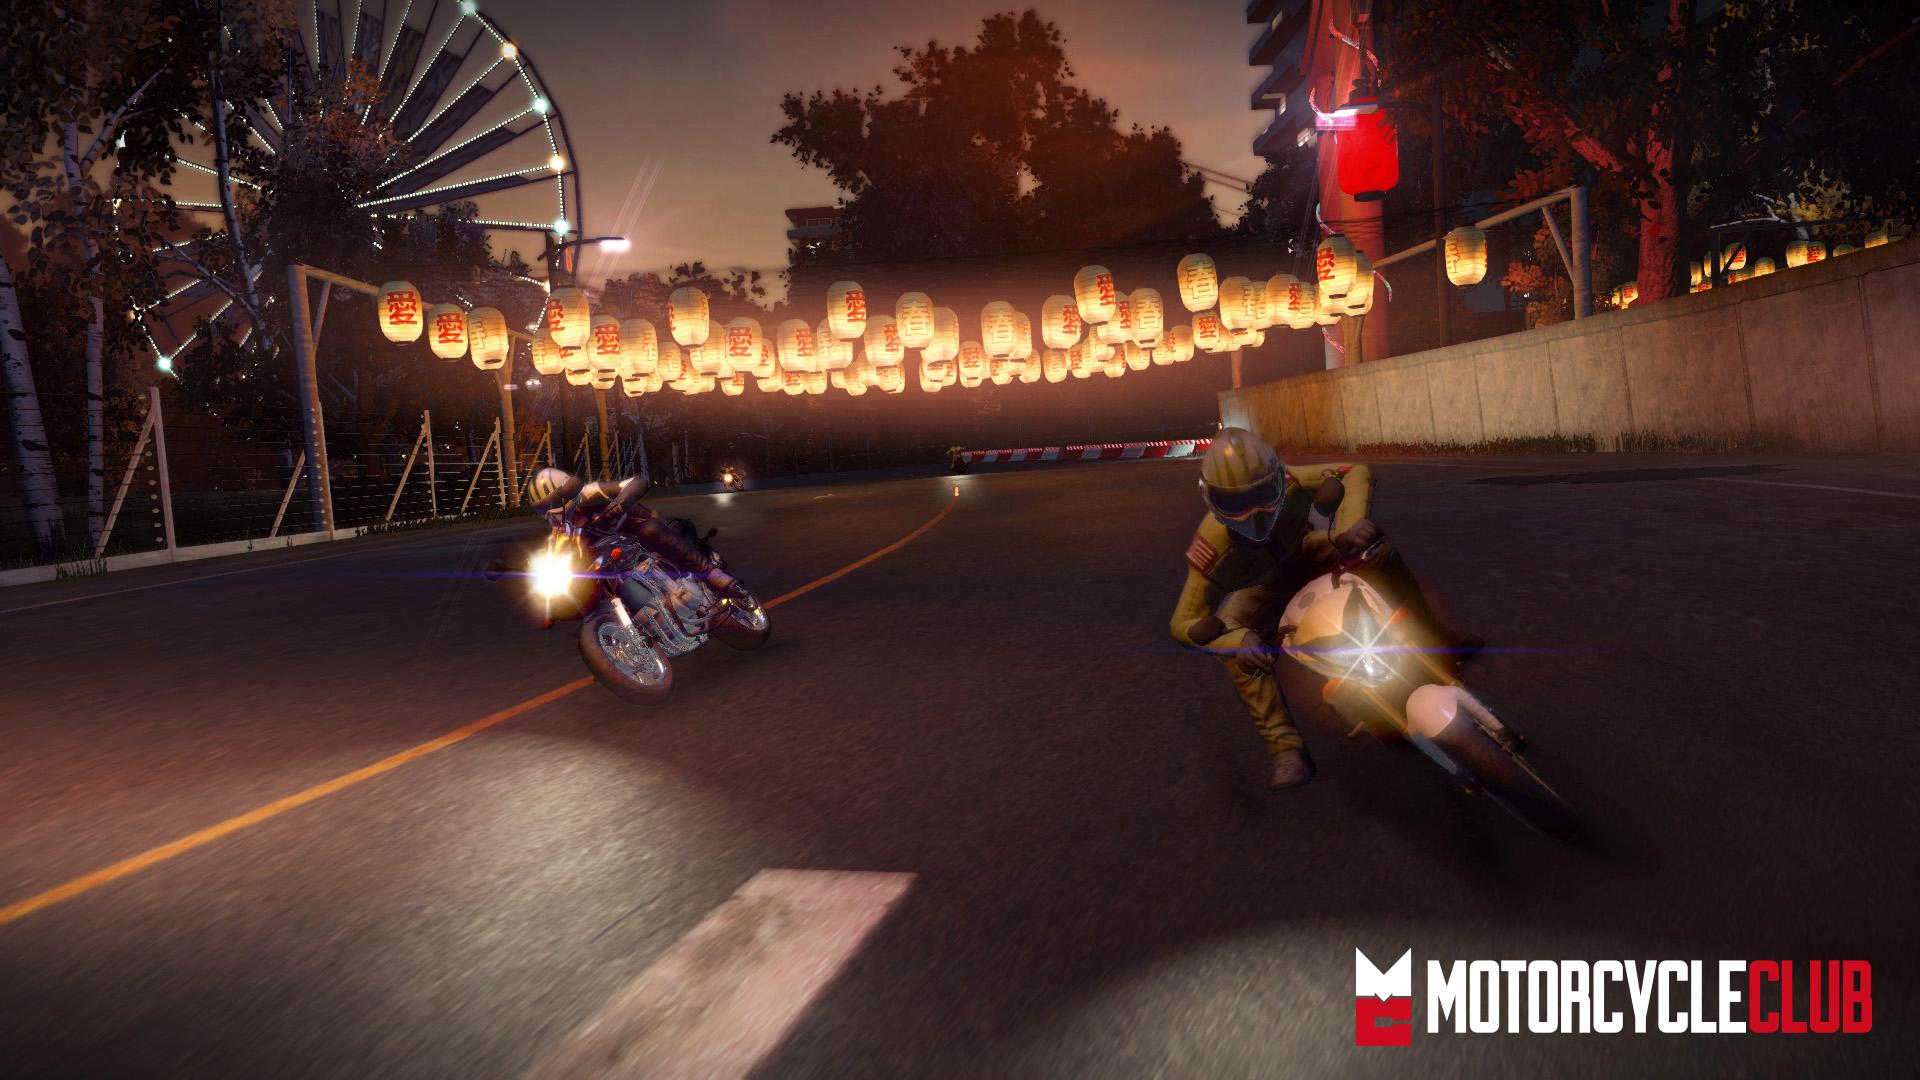 motorcycle-club-screens-psc-1